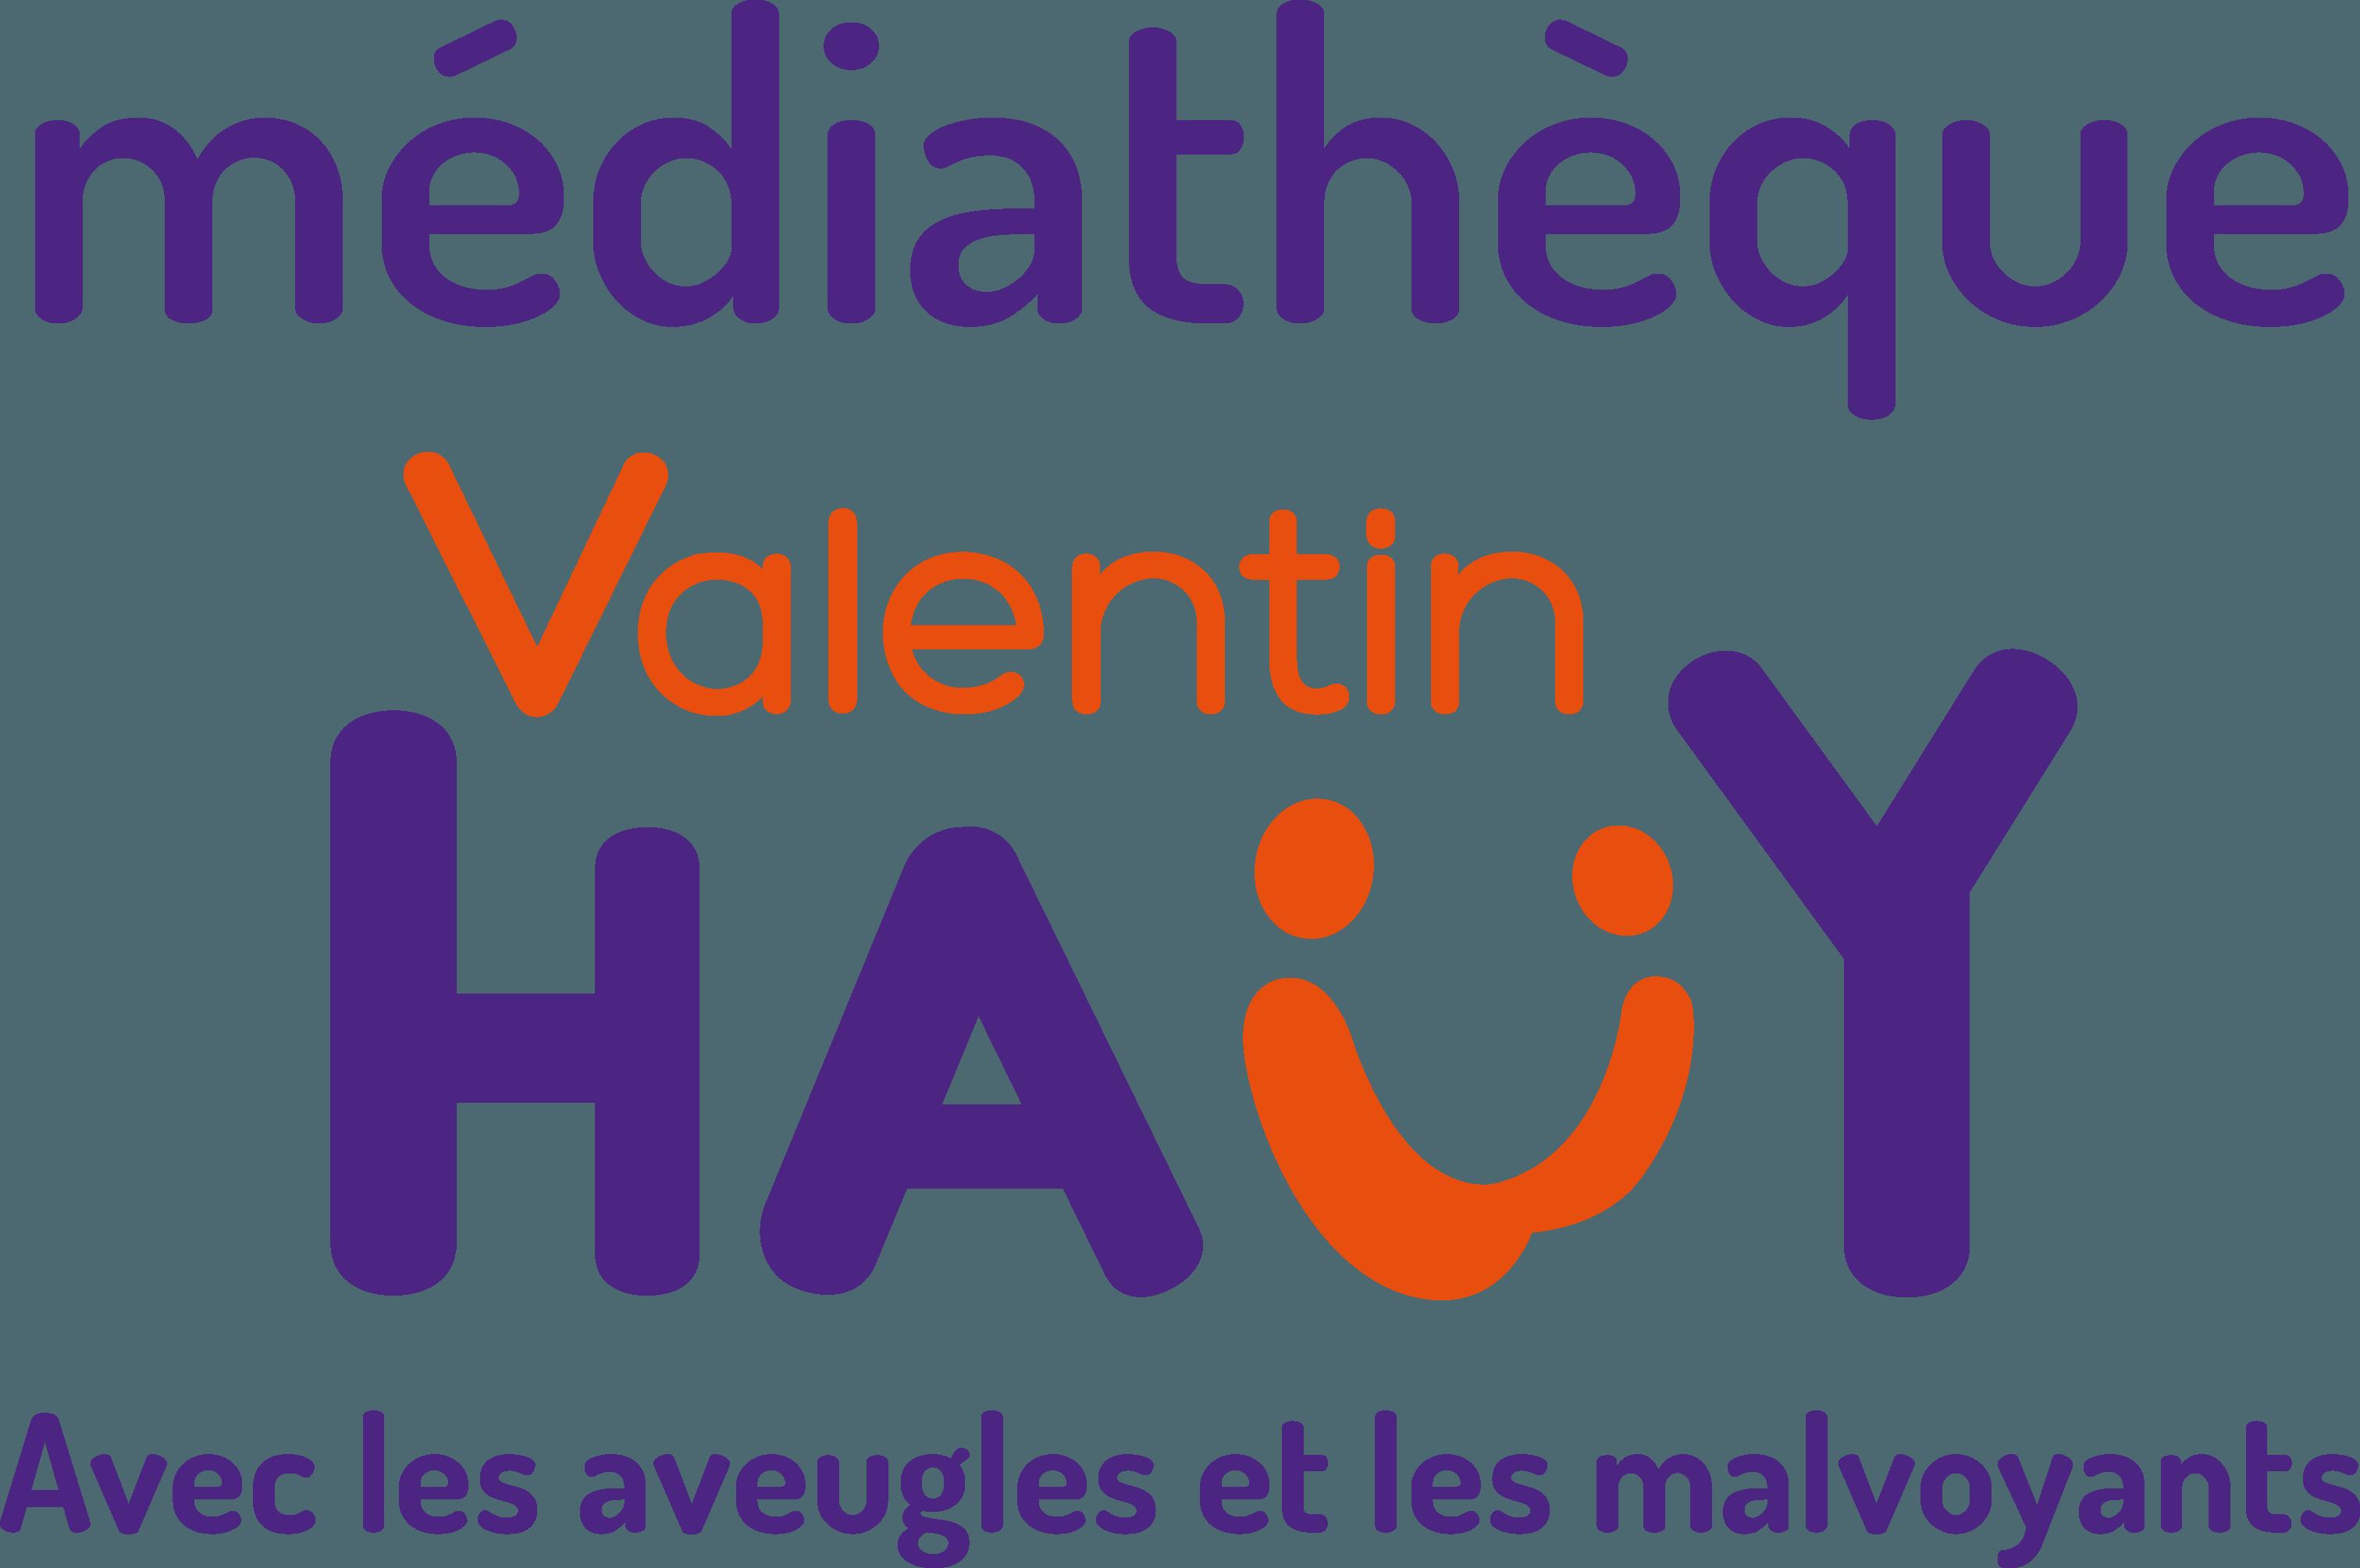 logo client cegi médiathèque valentin hauy